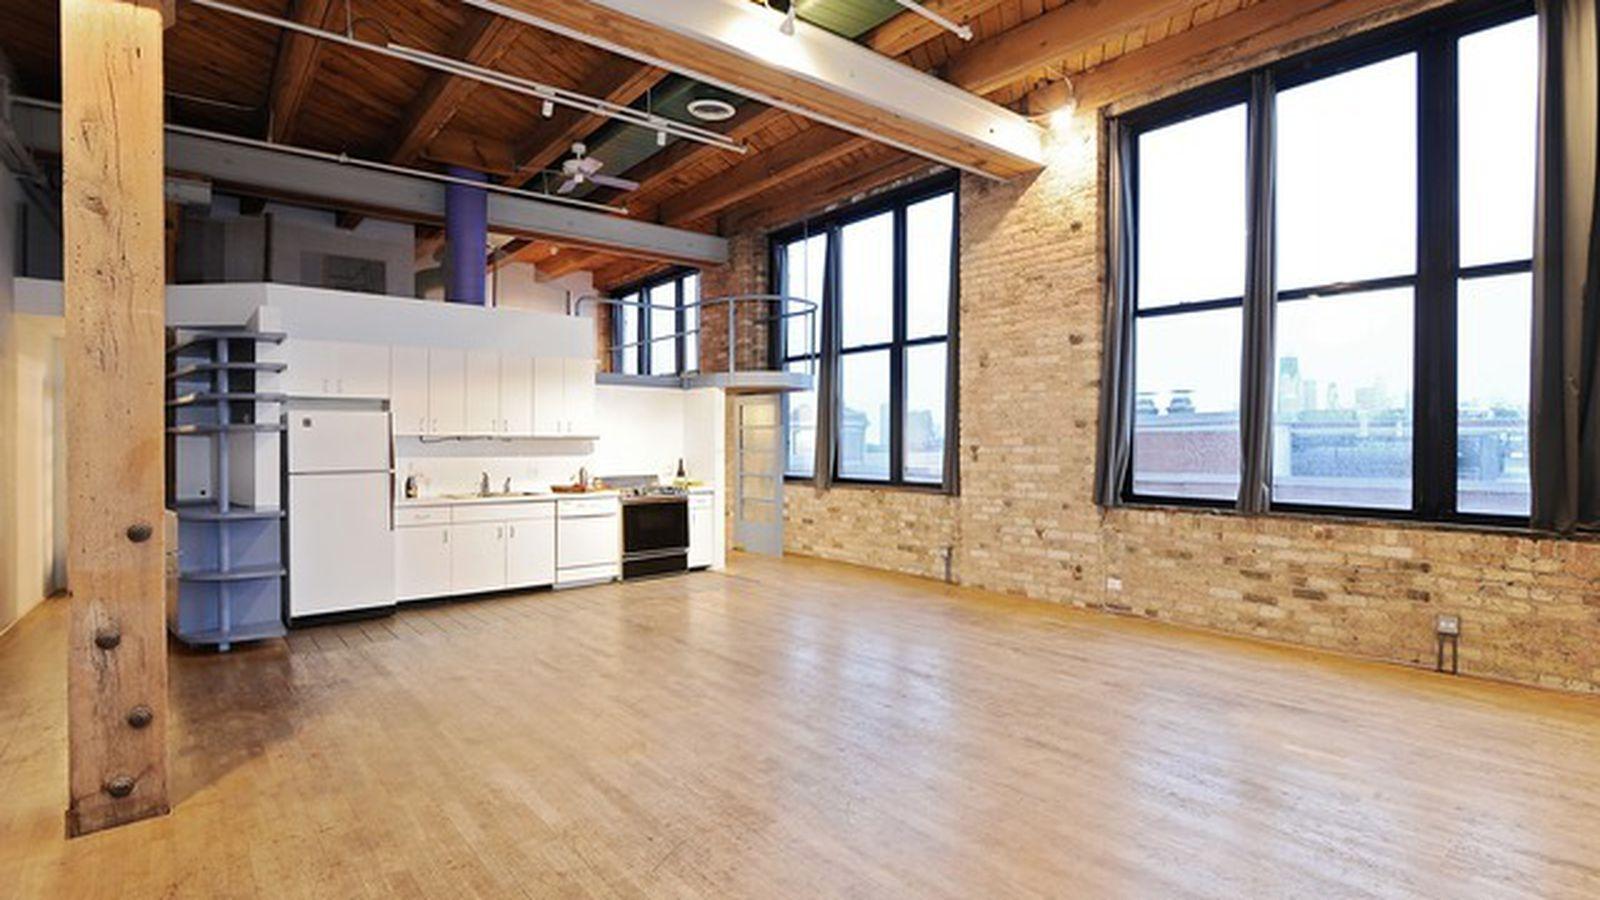 Open floor plan 39 duplex 39 loft in lincoln park seeks 300k for Nyc duplex for sale